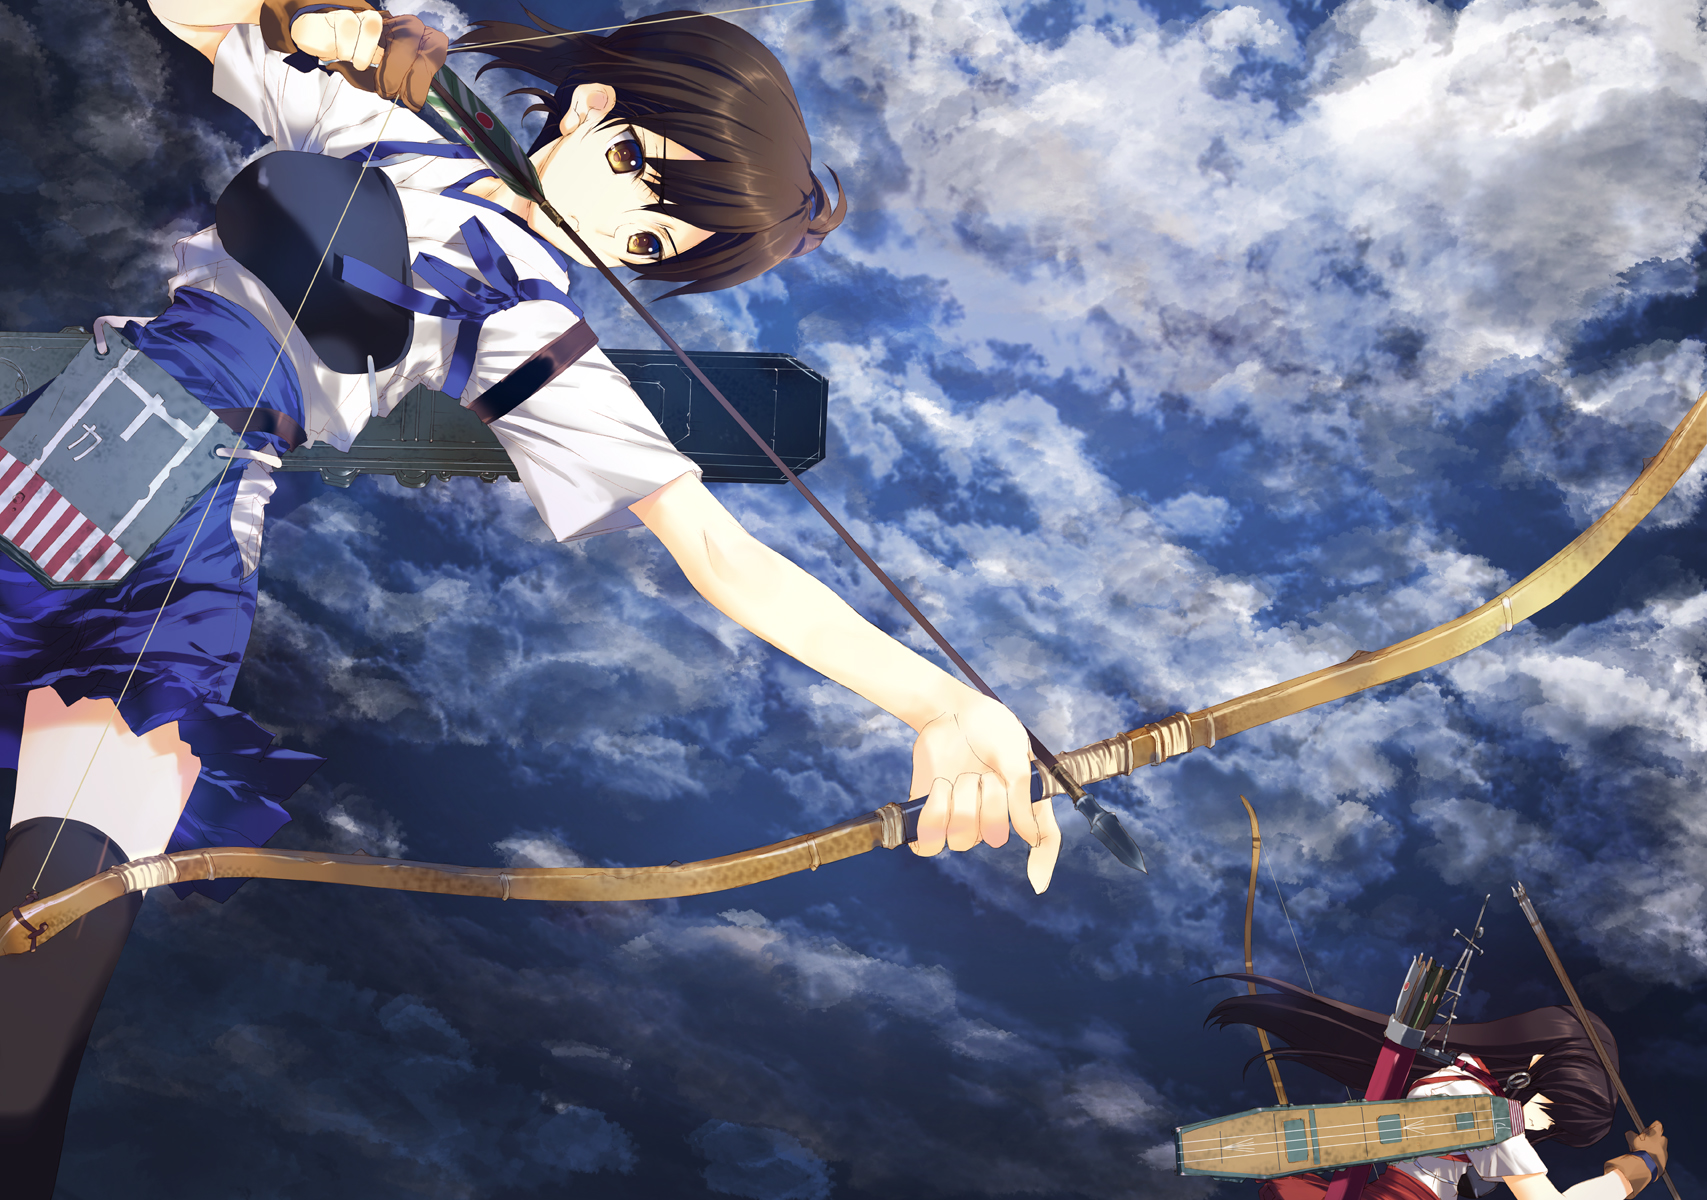 anime_wallpaper_Kantai_Collection_kaga_akagi_Nakamura_Takeshi-818812.jpeg